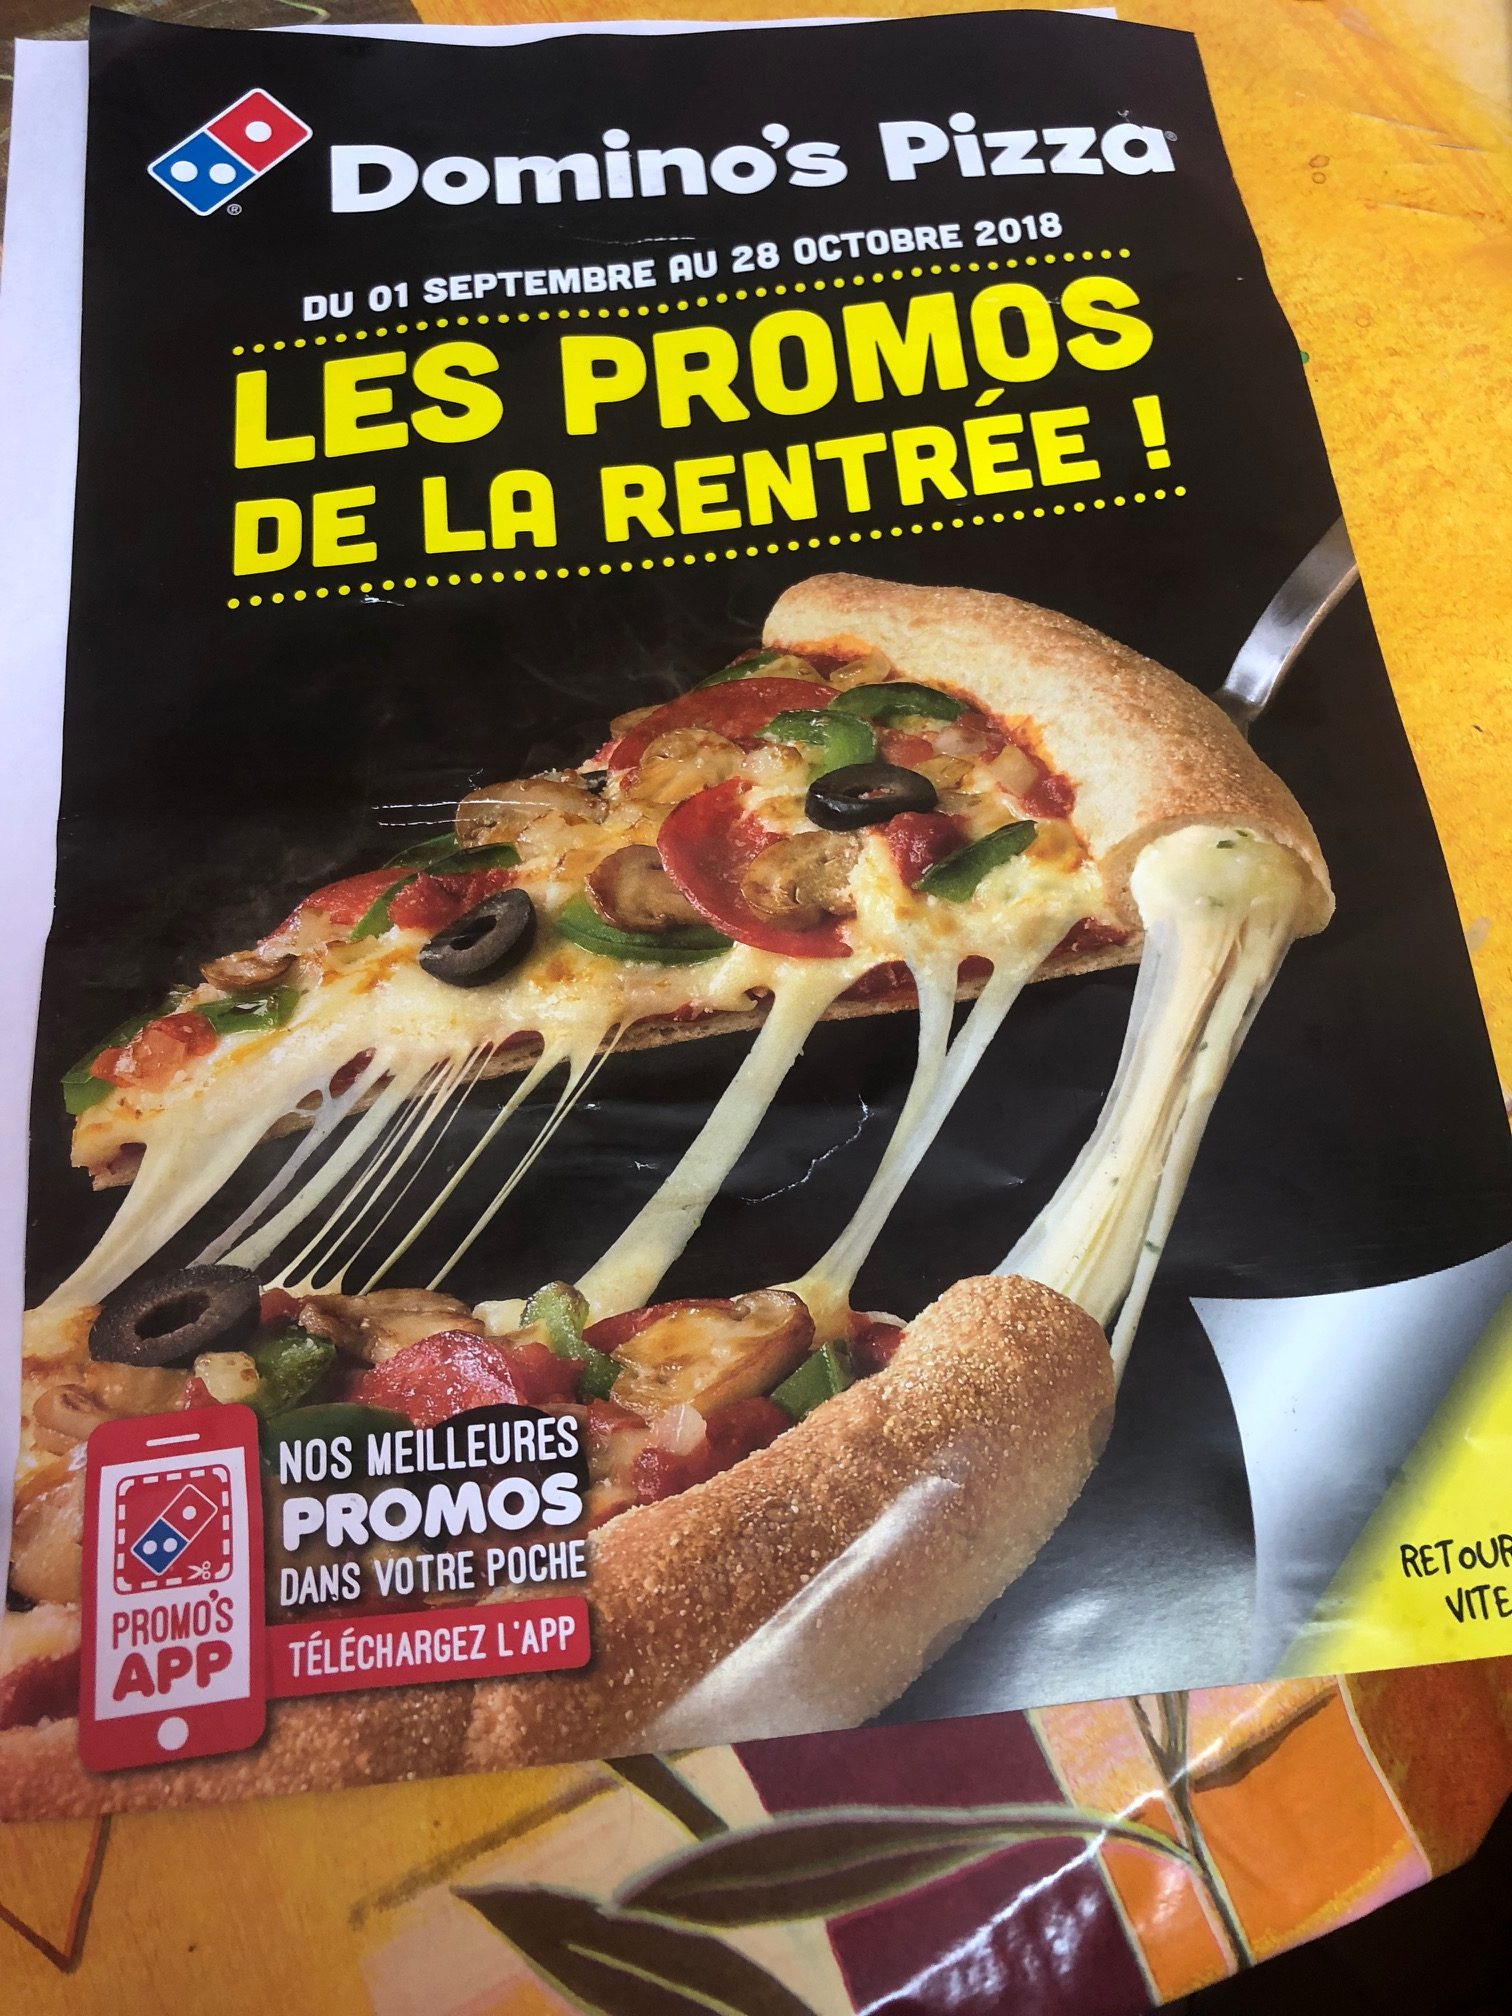 Wondering what's Rentrée & Pizza has in common ?